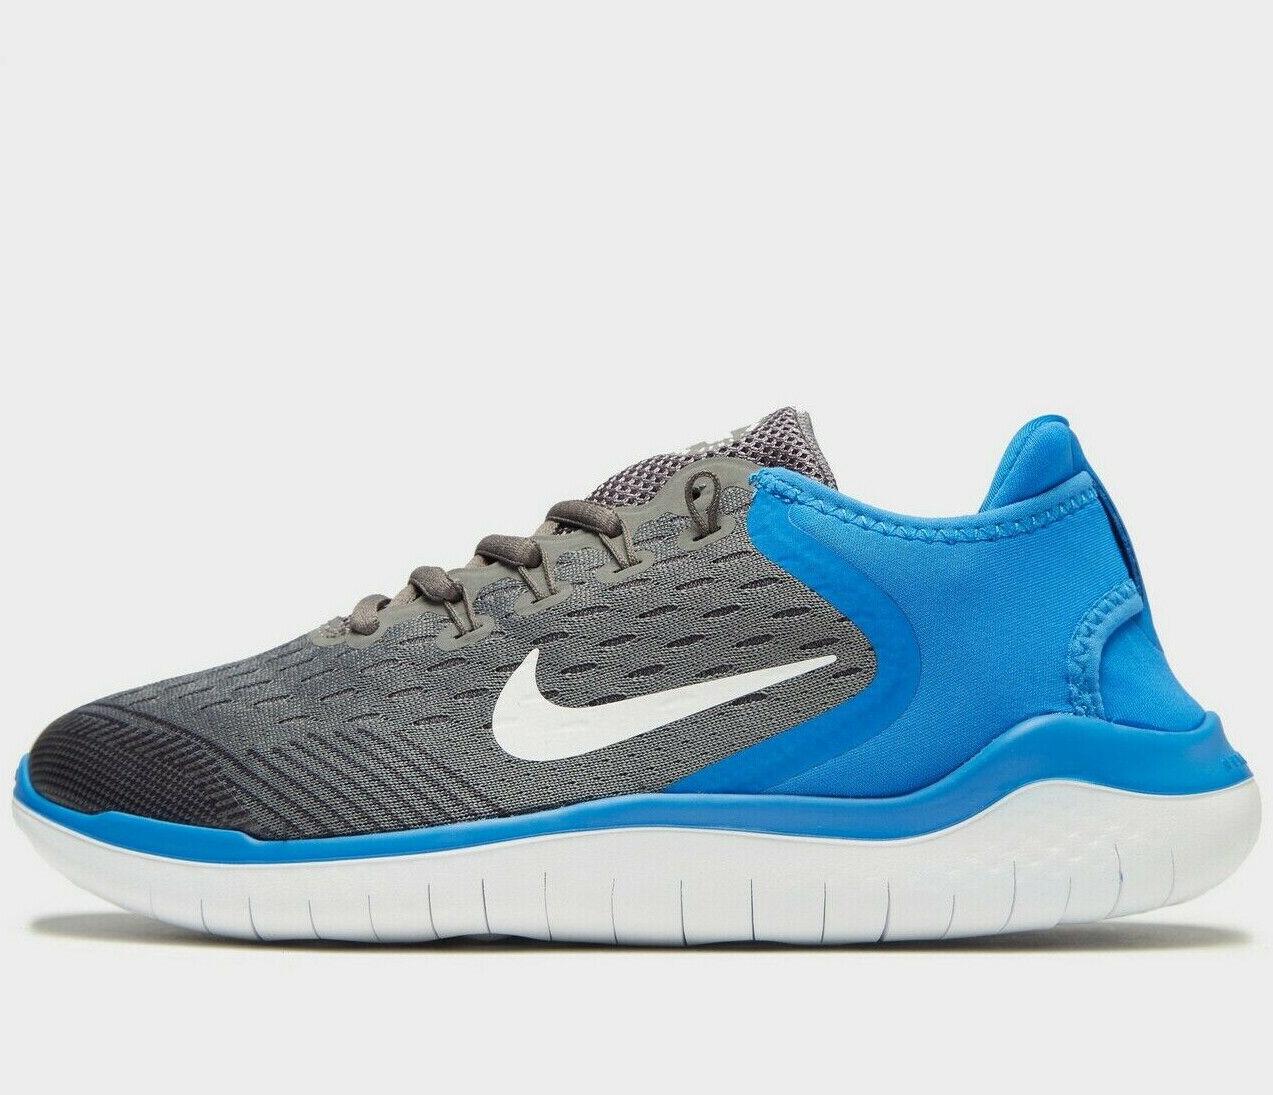 Nike Free Run 2018 Femmes ® (UK  5 & 5.5) Gunsmoke Signal Bleu Nouveau